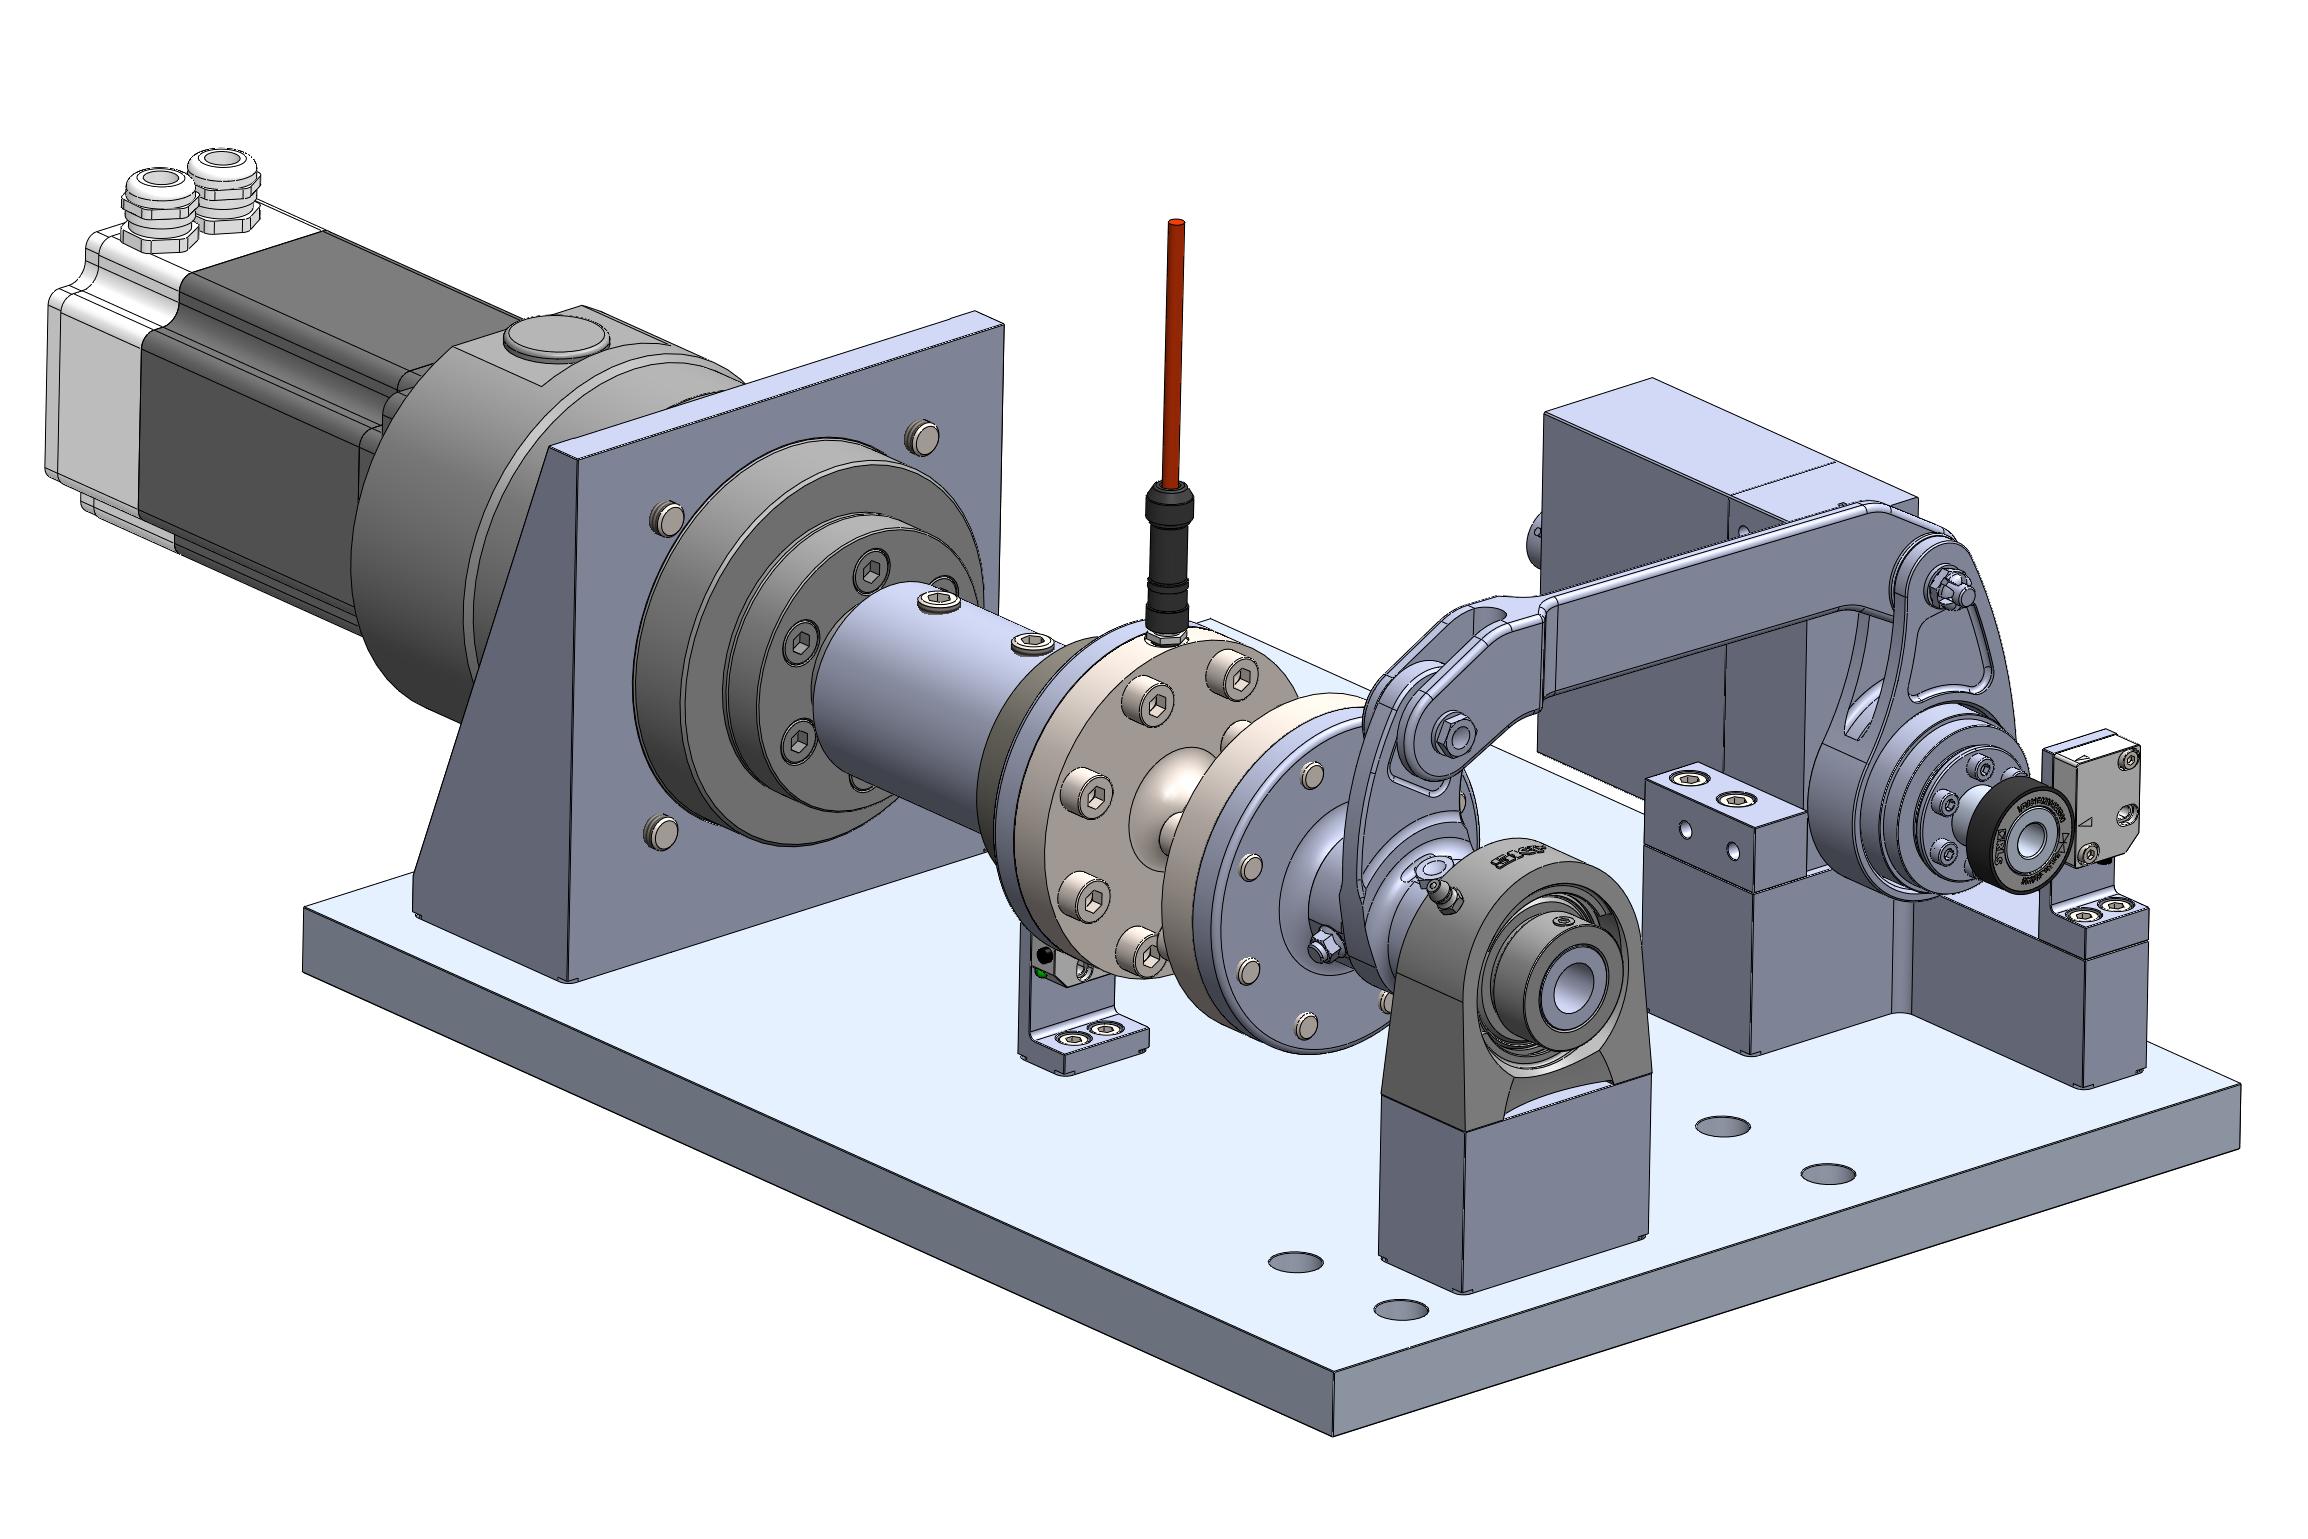 Ampyx Power – Horizontal Tail Mechanism Test Rig